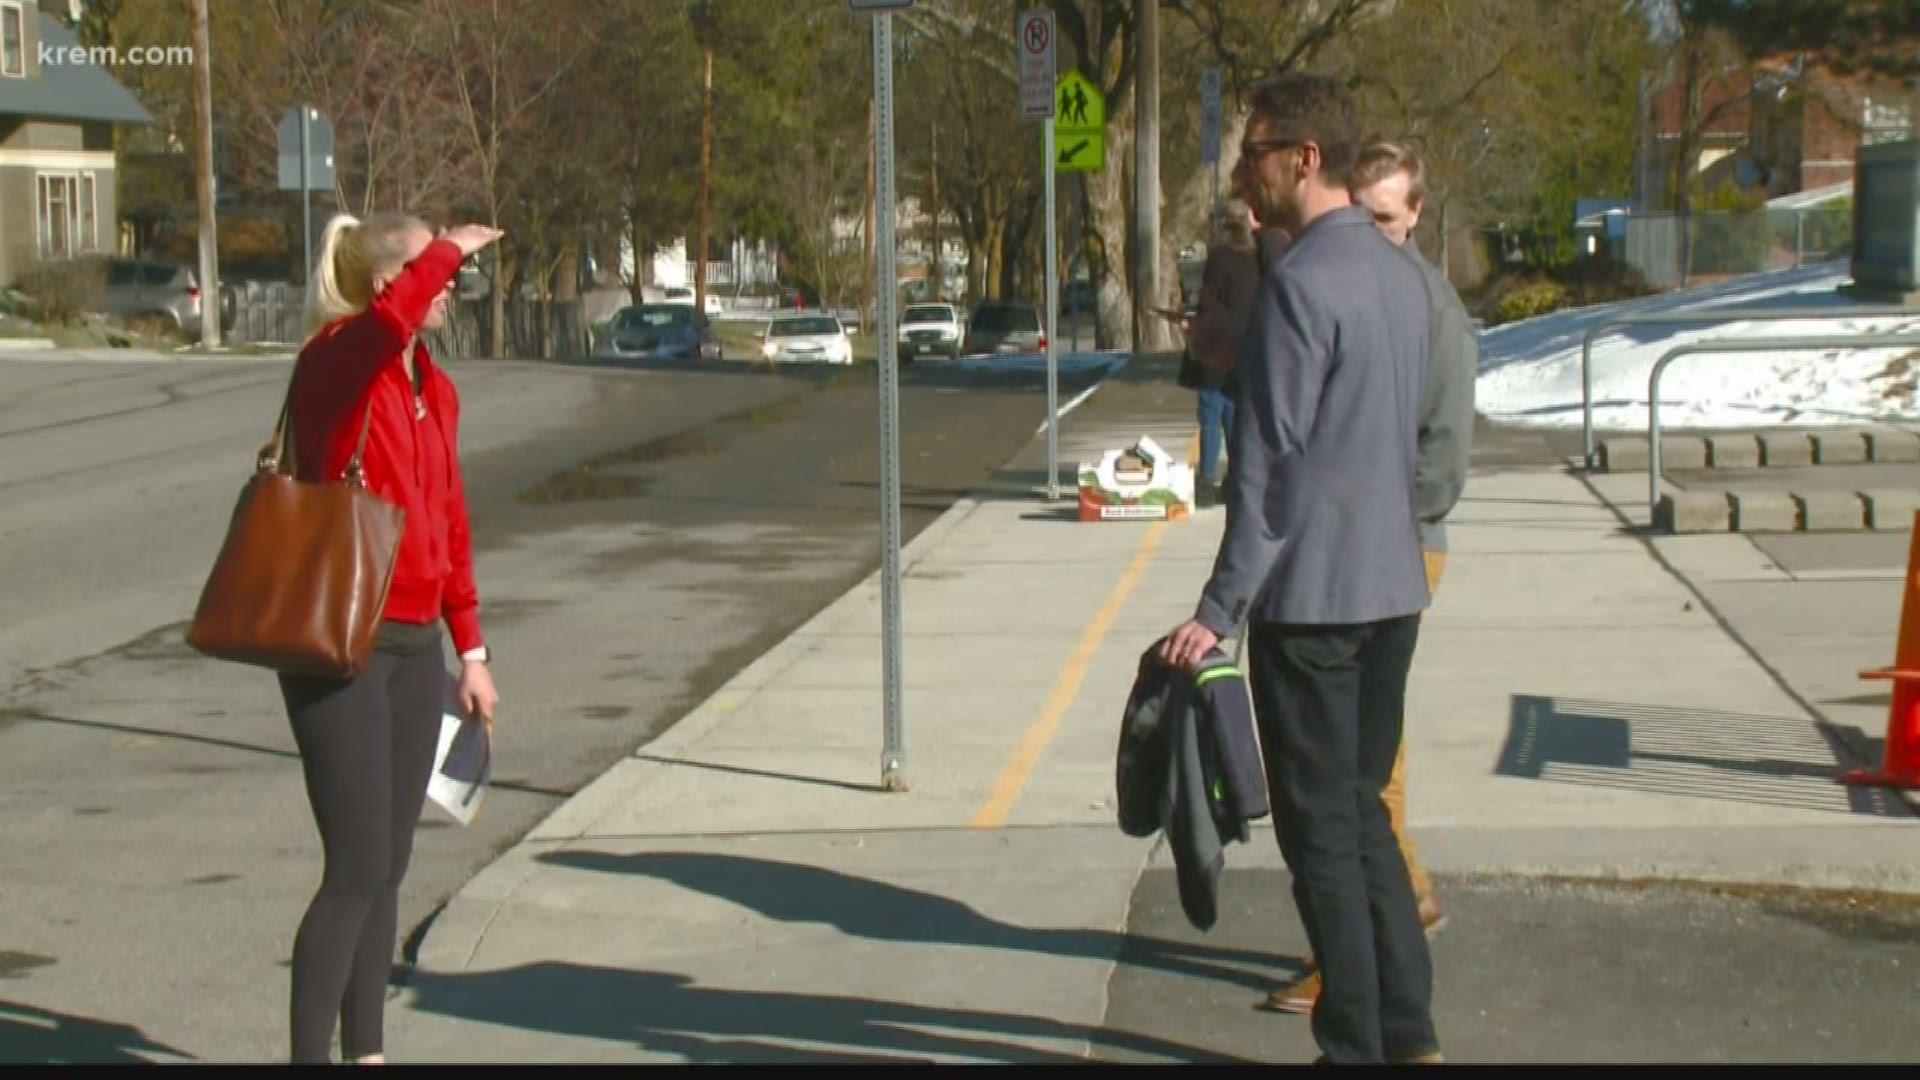 Spokane Public Schools offers grab and go meals starting today   krem.com